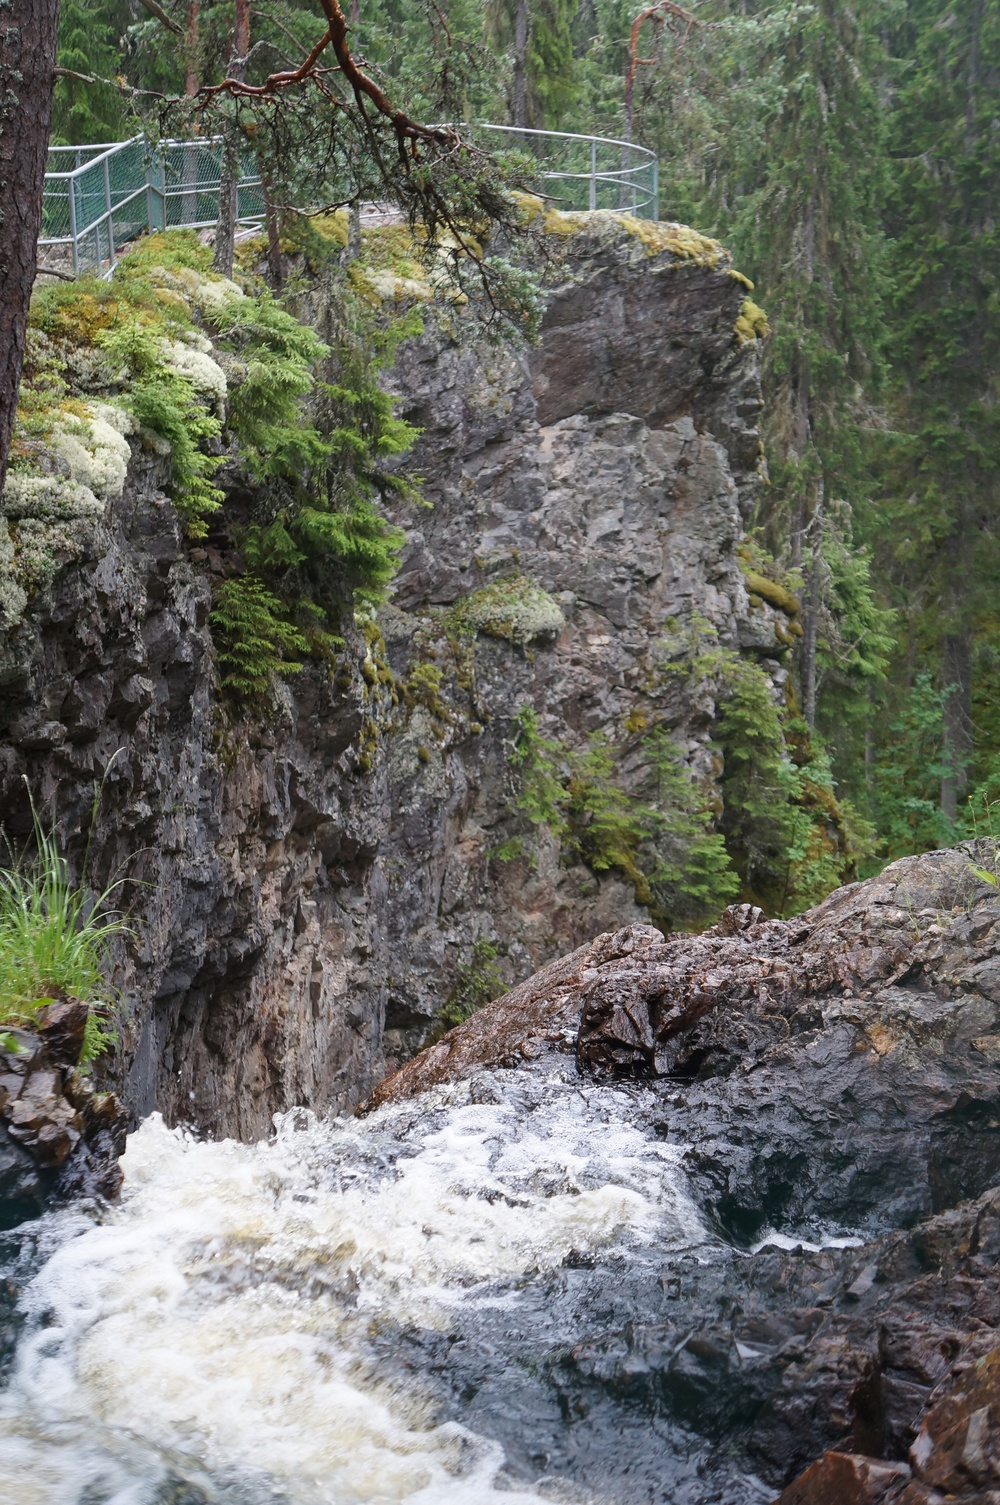 Styggforsen waterfall, Rättvik, Dalarna county, Sweden